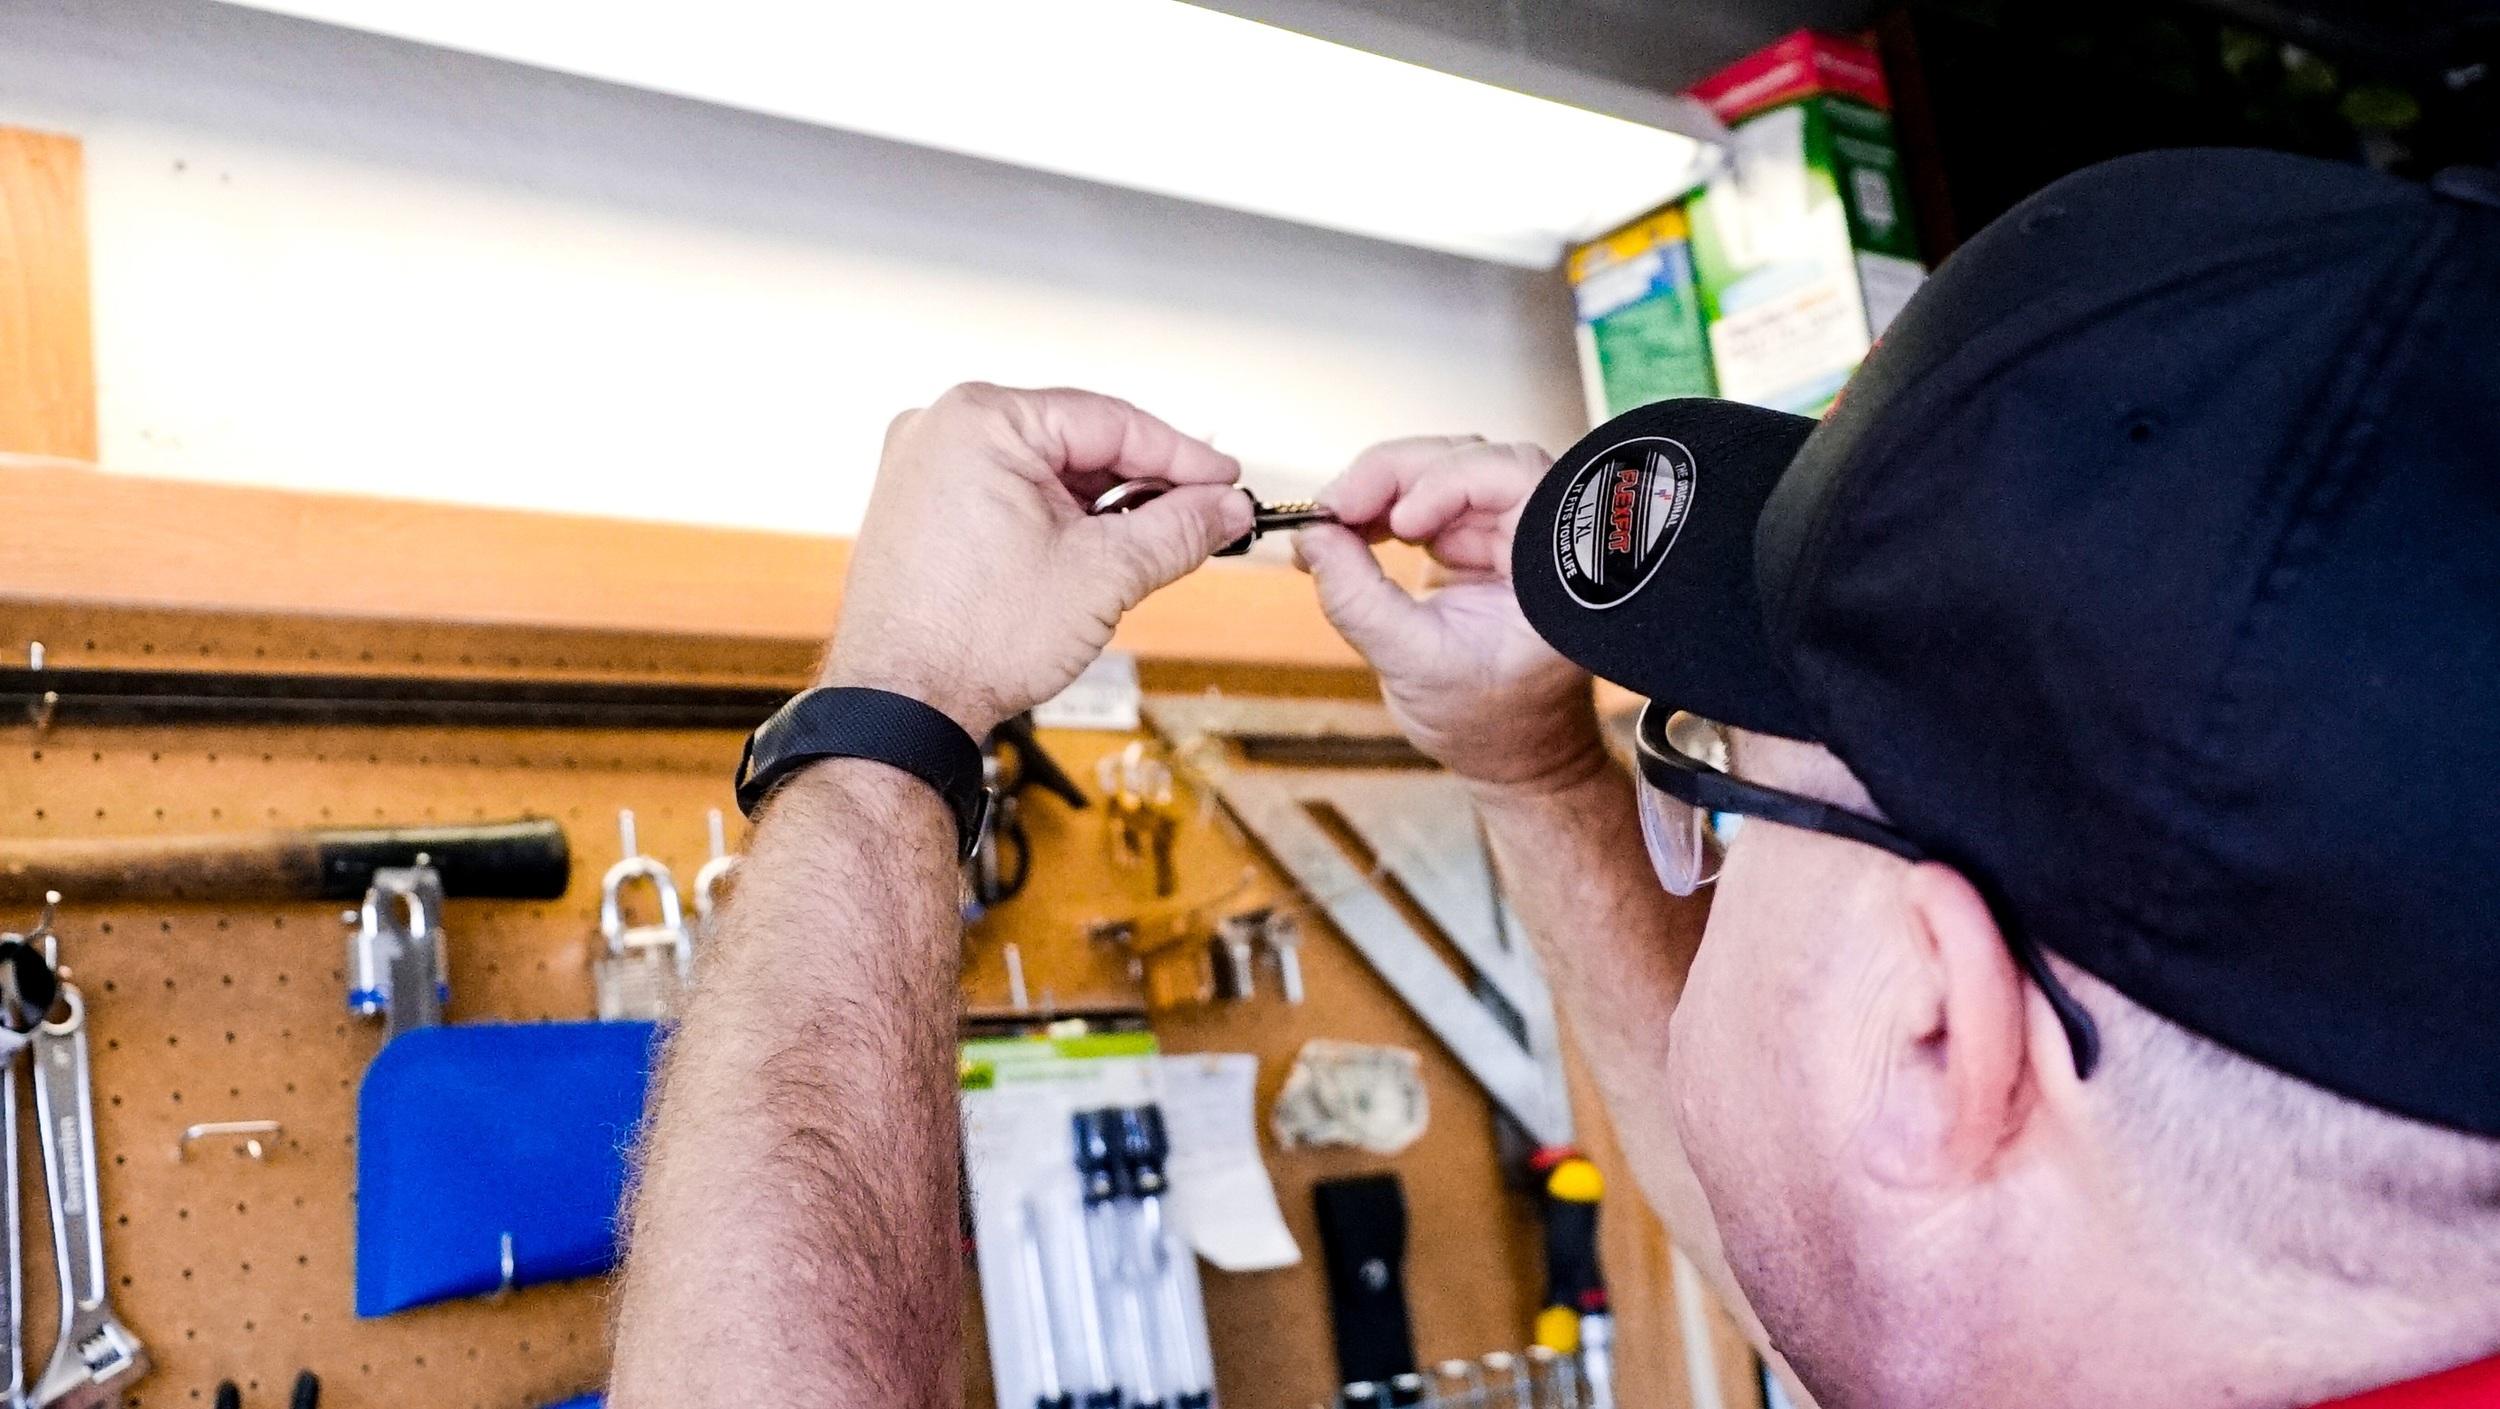 We focus on high quality locksmith work